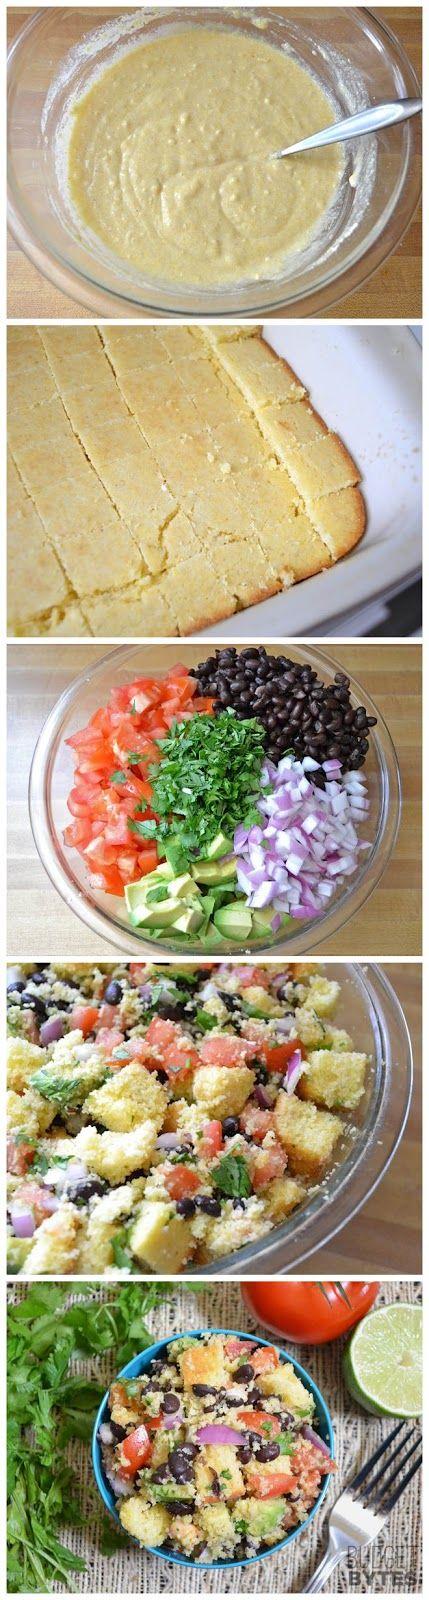 Southwest Cornbread Salad witih Honey-LIme Dressing